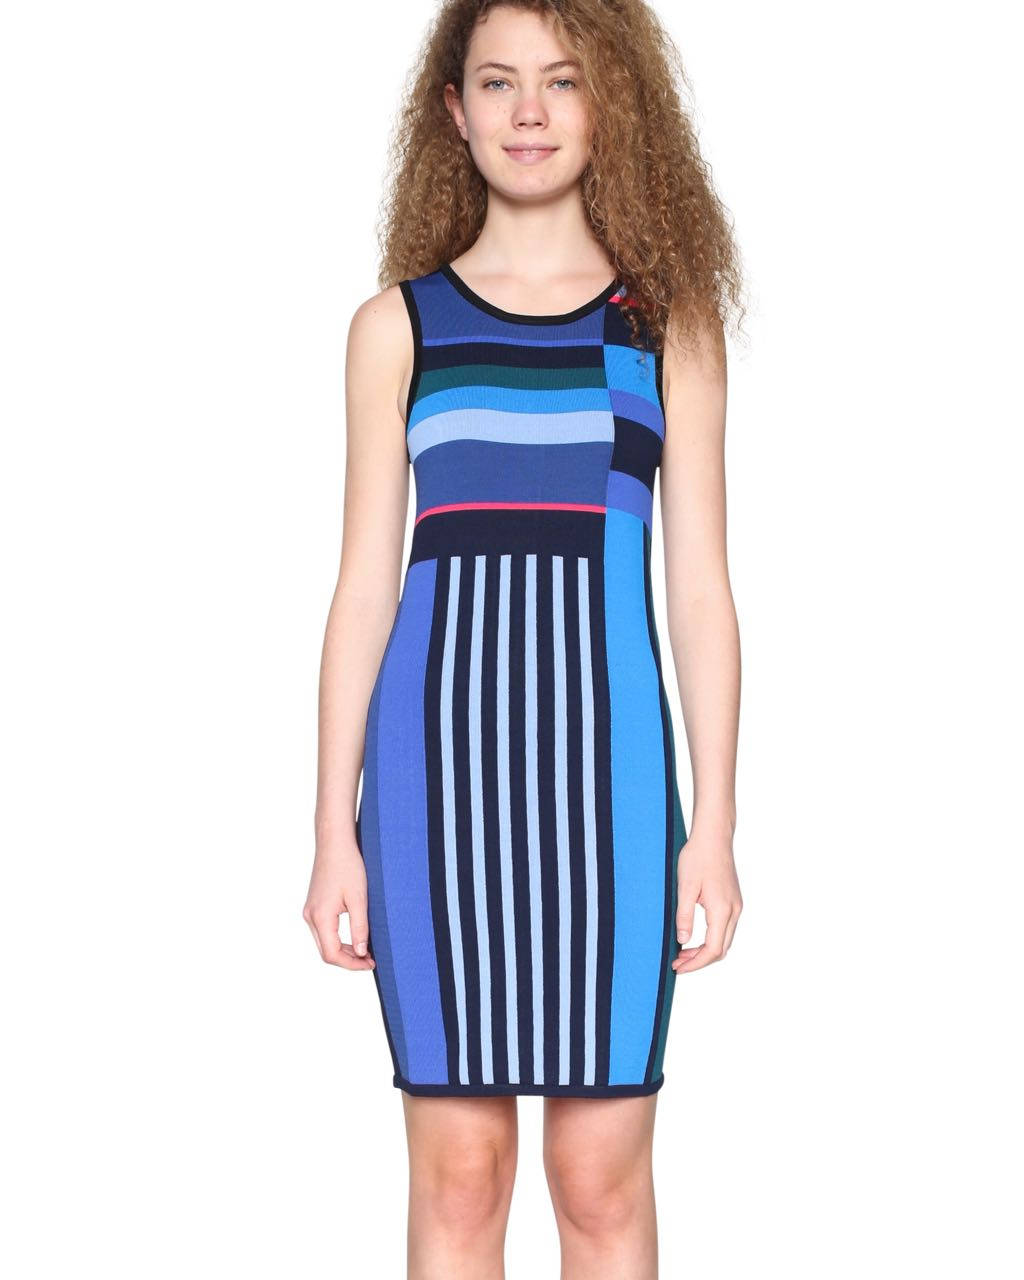 18SWVF14_5027 Desigual Dress Amico Buy Online